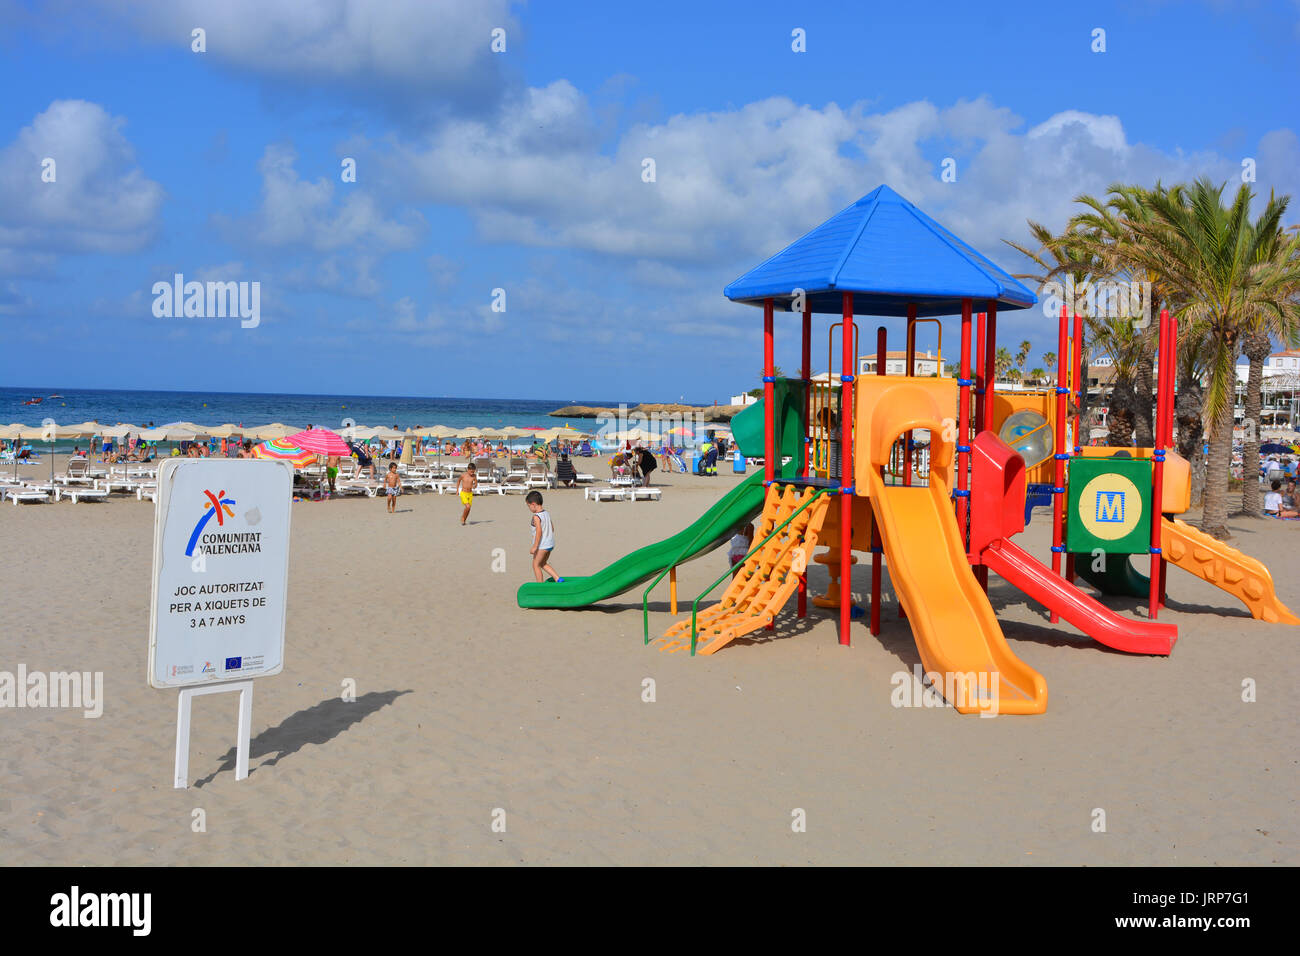 latina-jocuri-cu-summer-beach-dating-horny